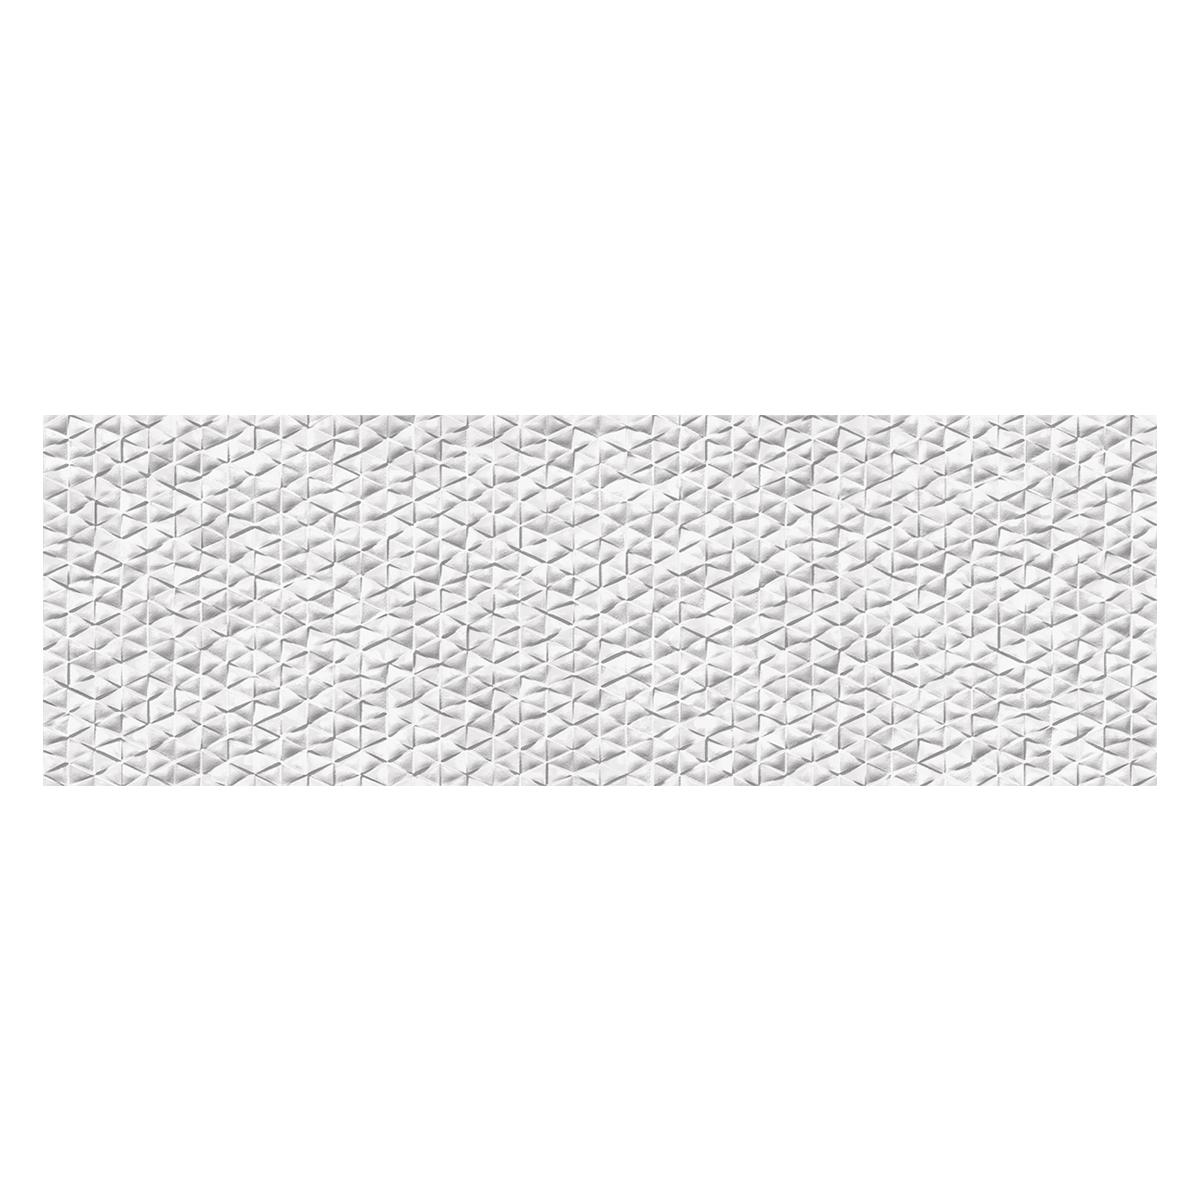 Mayólica Arc Blanco Mate - 30X90 cm - 1.08 m2